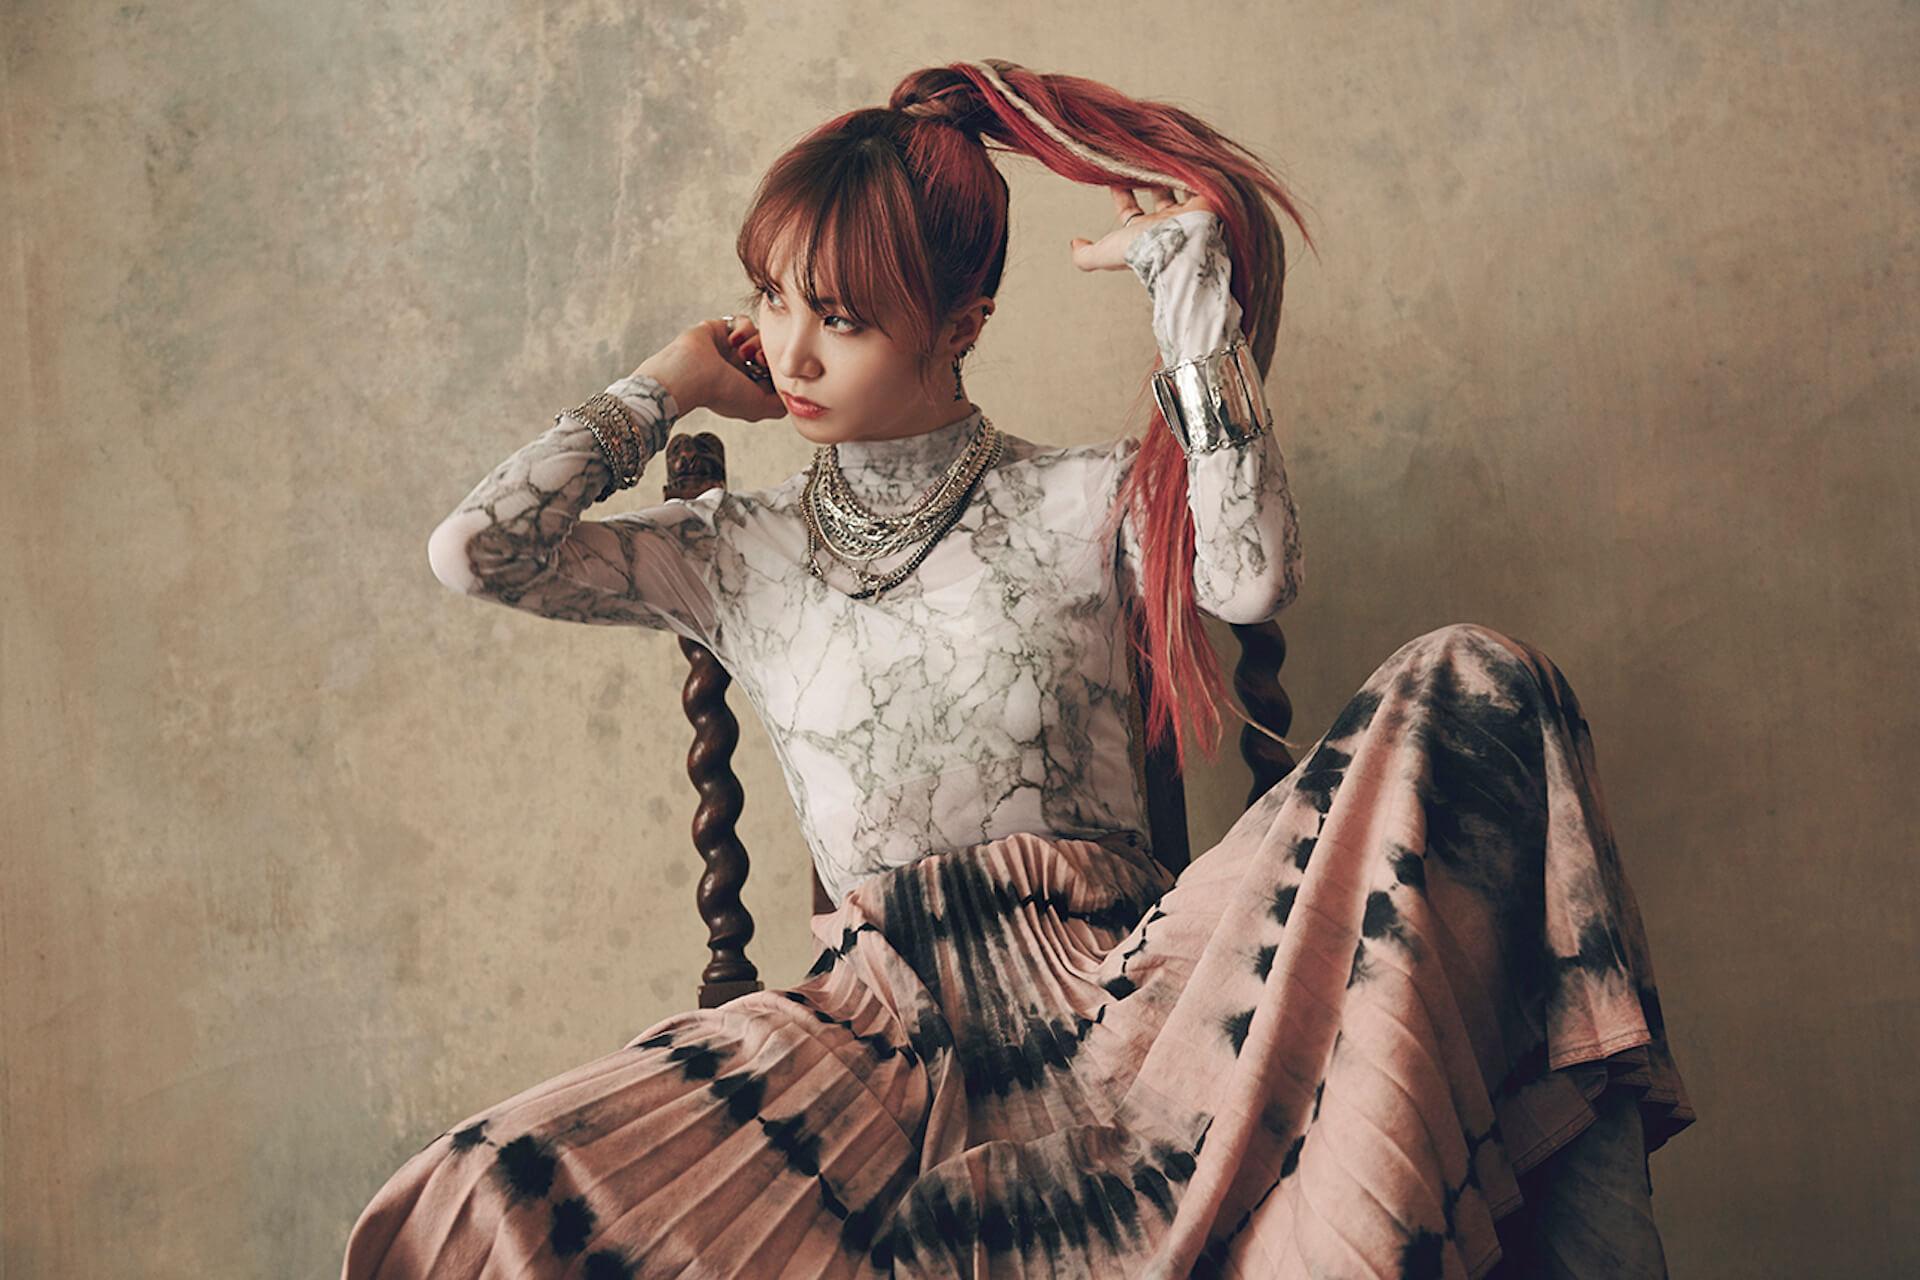 "LiSAによる『劇場版「鬼滅の刃」無限列車編』主題歌""炎""がシングルリリース決定&MVも公開!大ヒット曲""紅蓮華""を収録したアルバム『LEO-NiNE』も発表 music201013_kimetsunoyaiba_lisa_1"